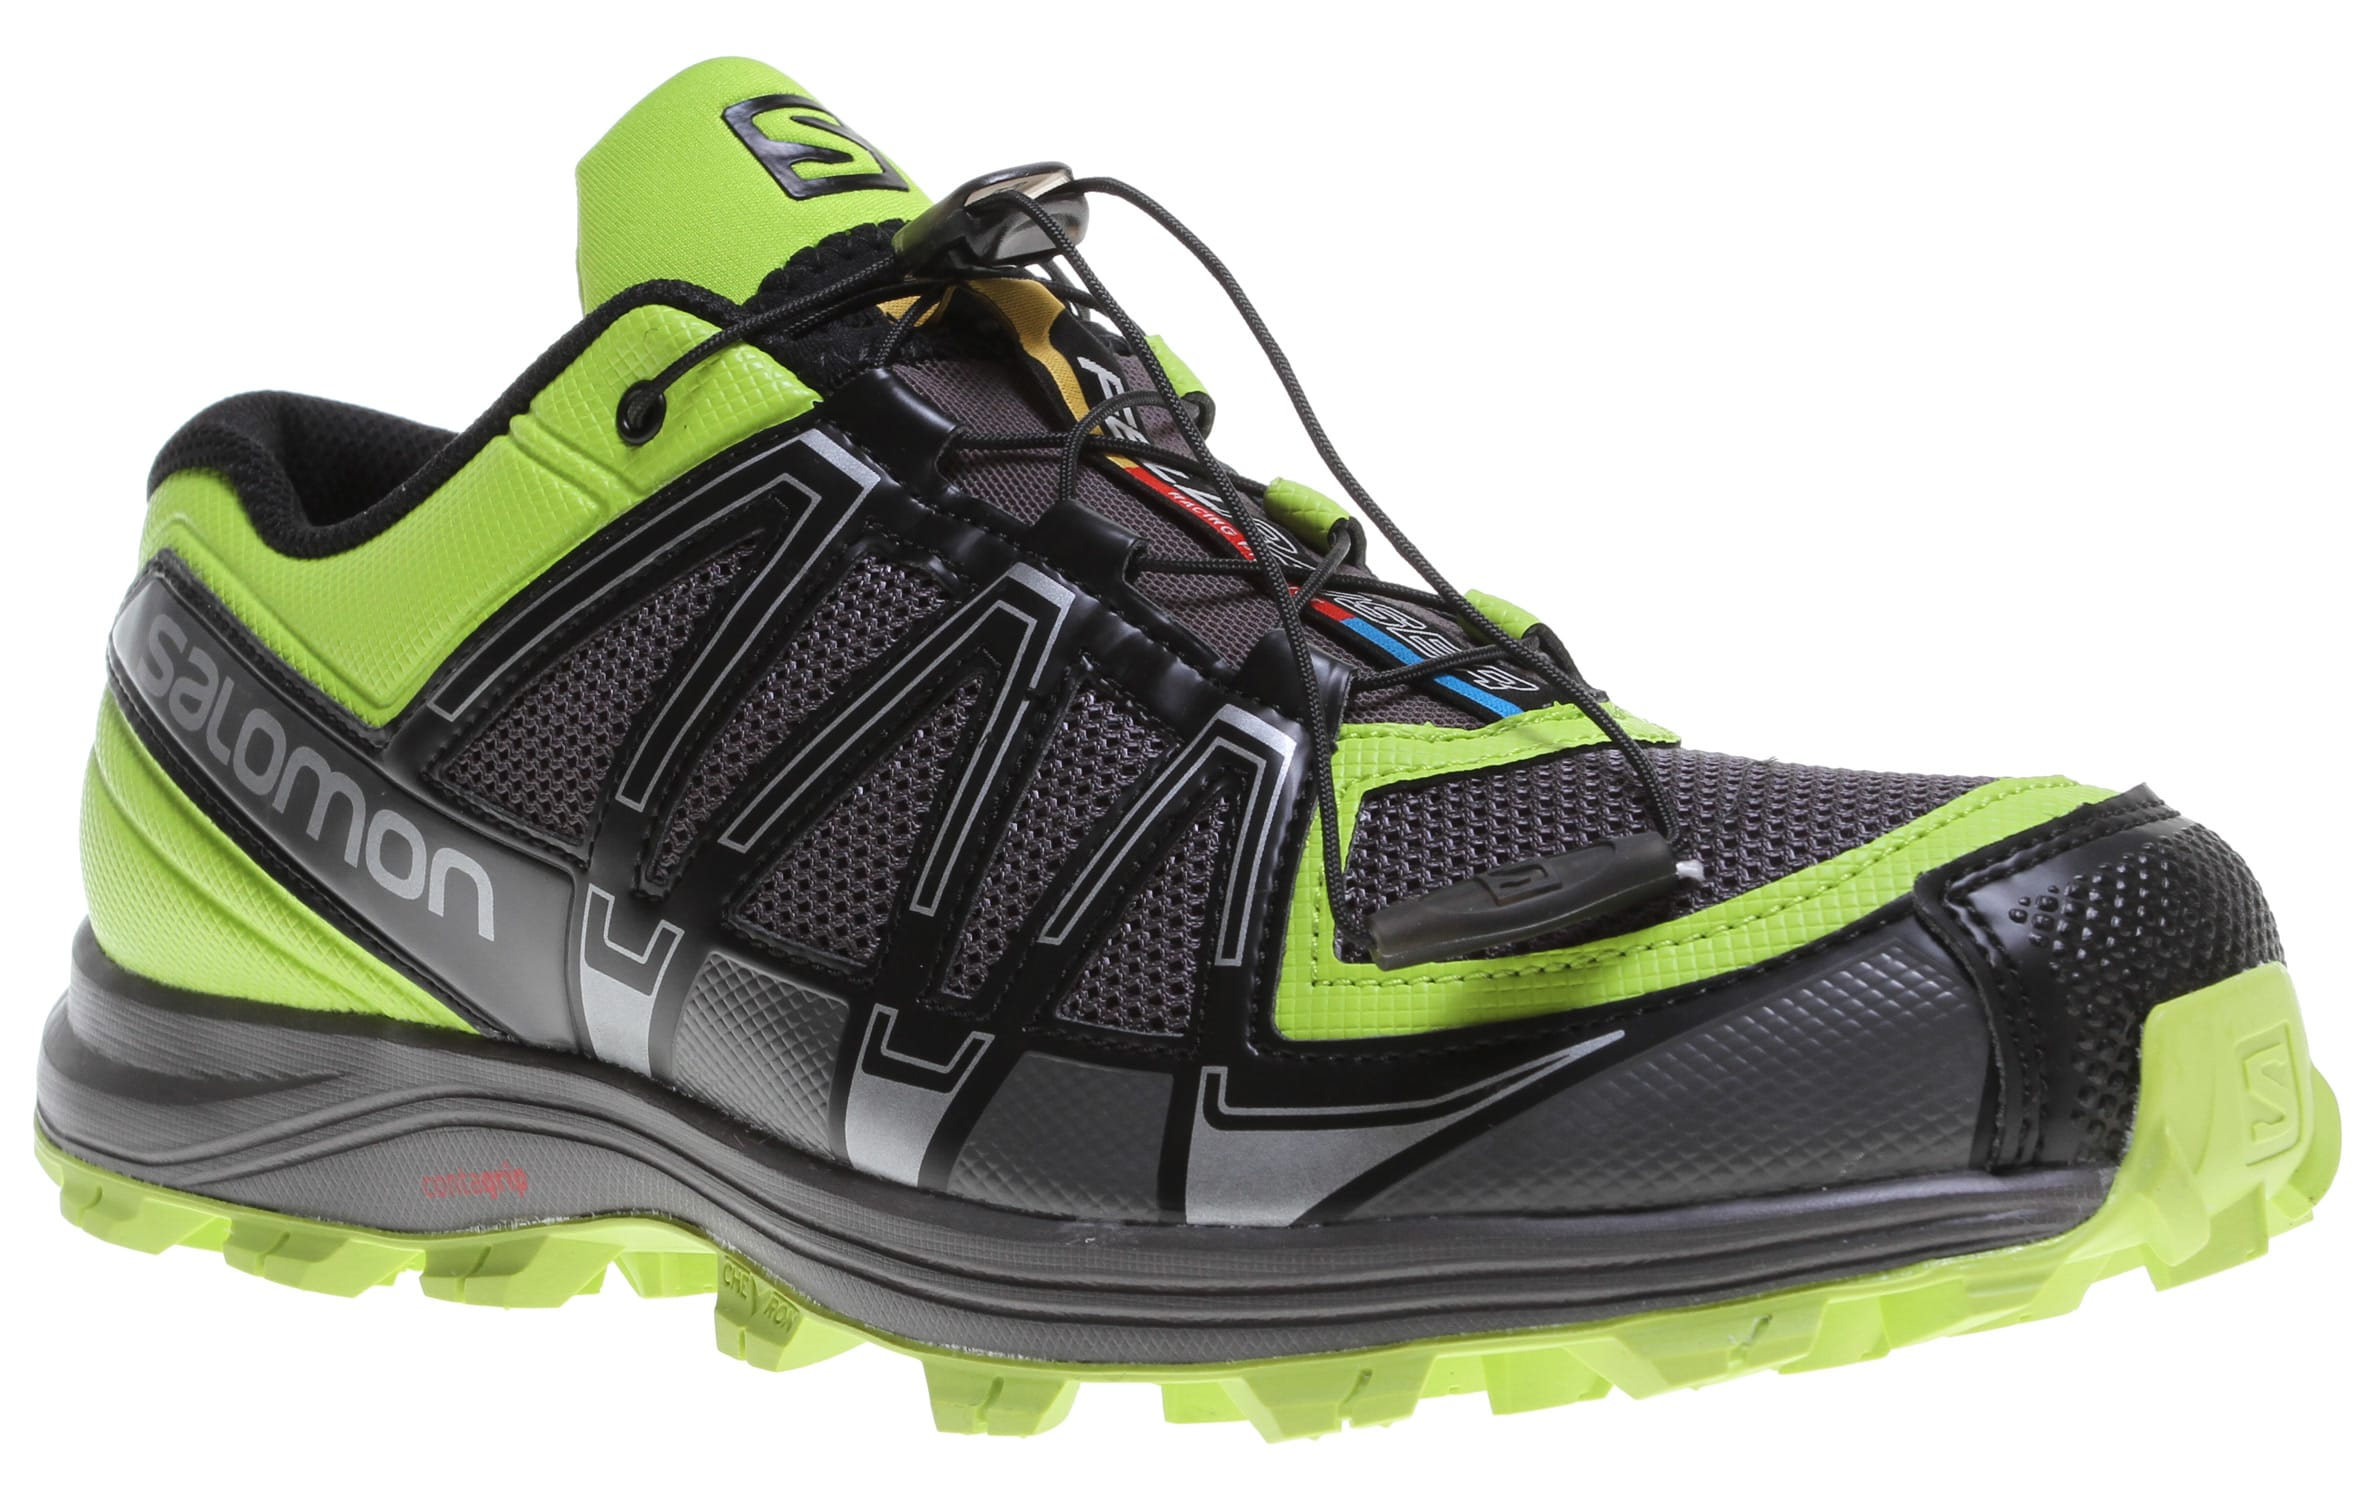 buy online 5a1d7 dea8b Salomon Fellraiser Shoes